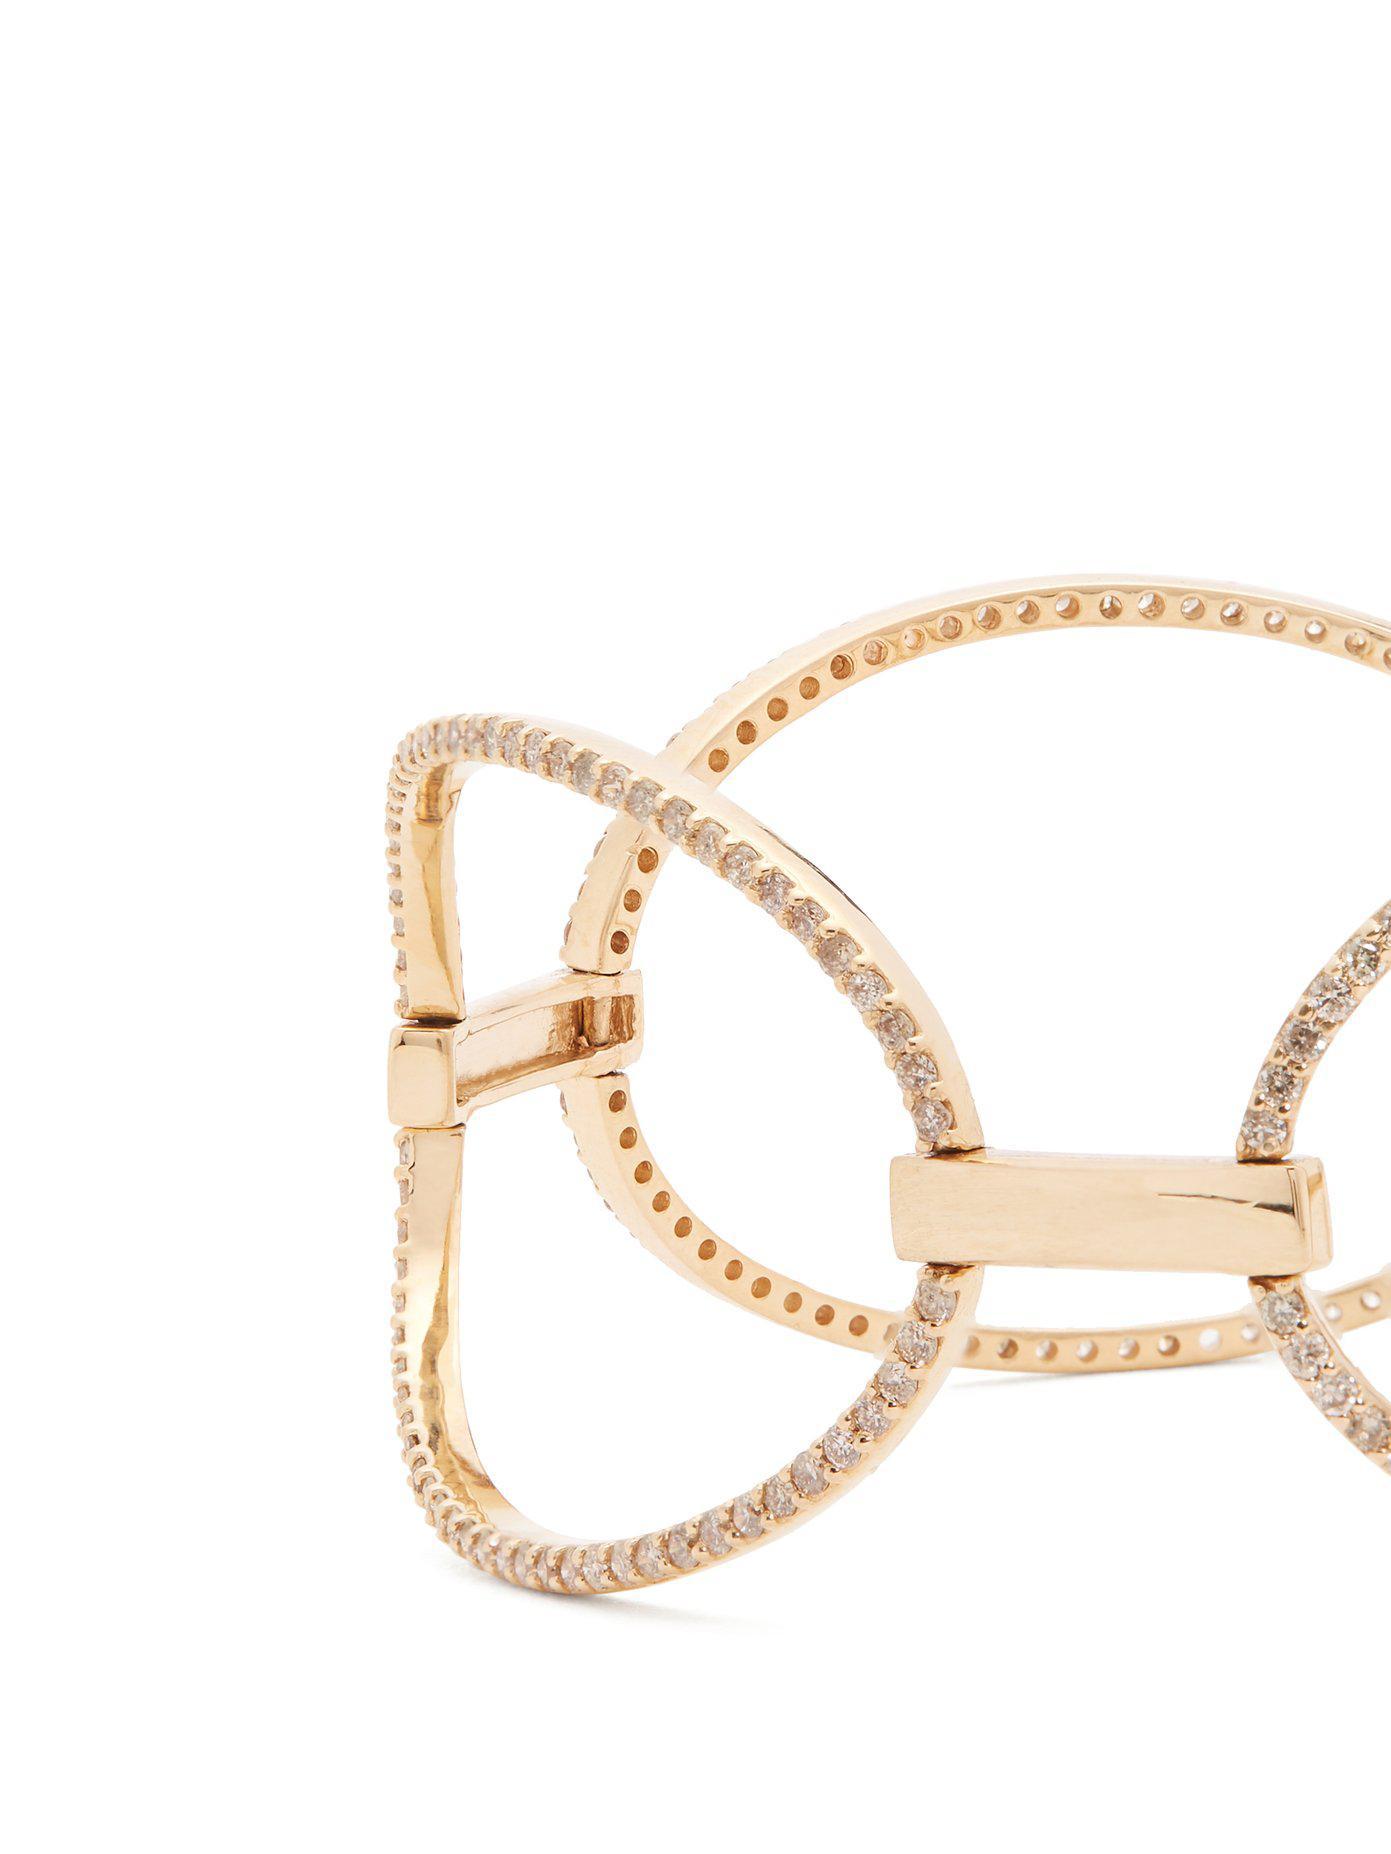 Diamant Et Bracelet En Or Jaune Ileana Makri D3ipyAK